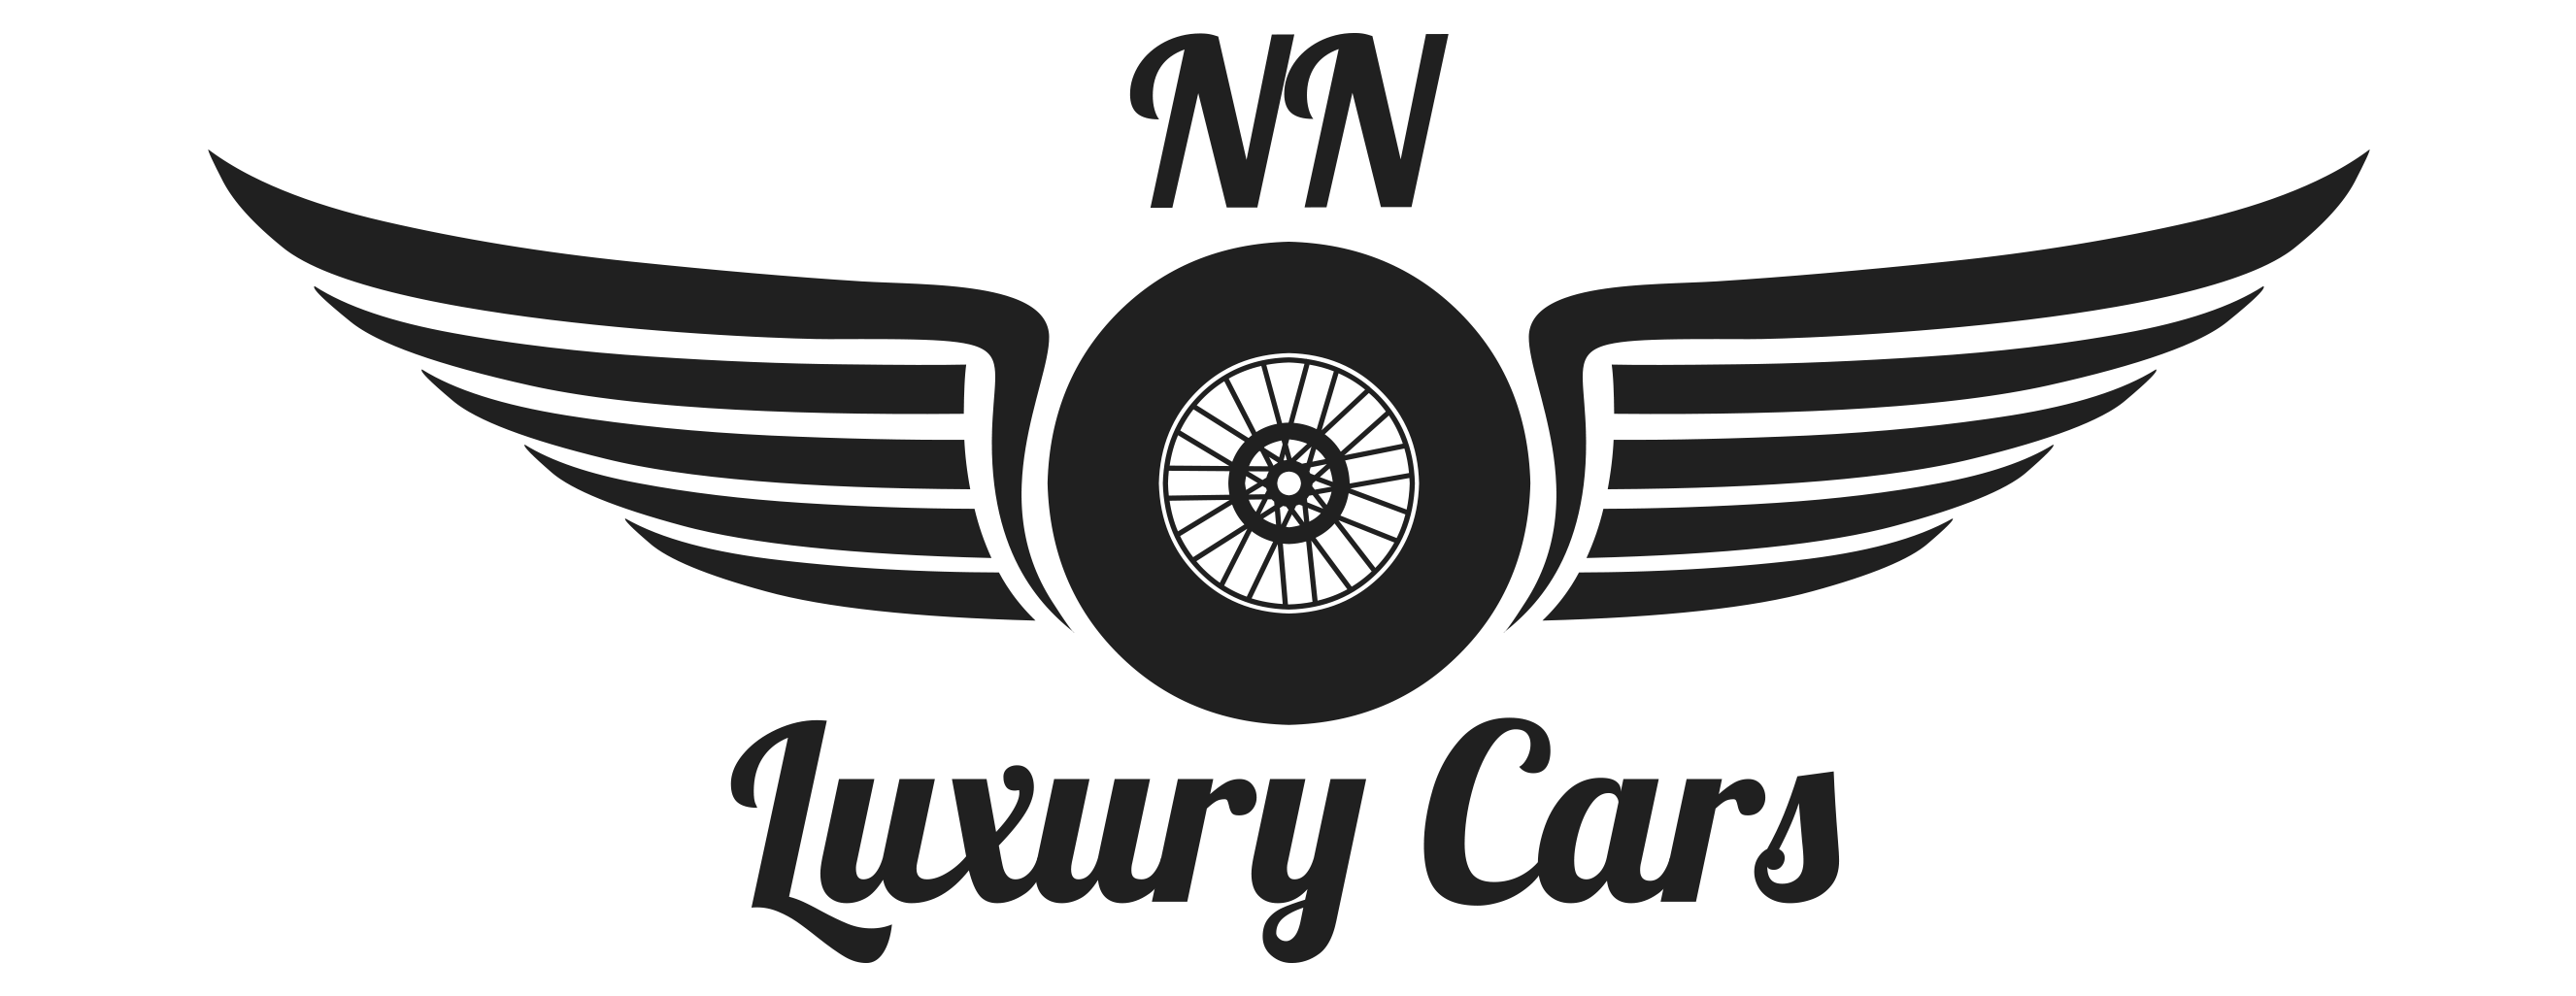 NN Luxury Cars